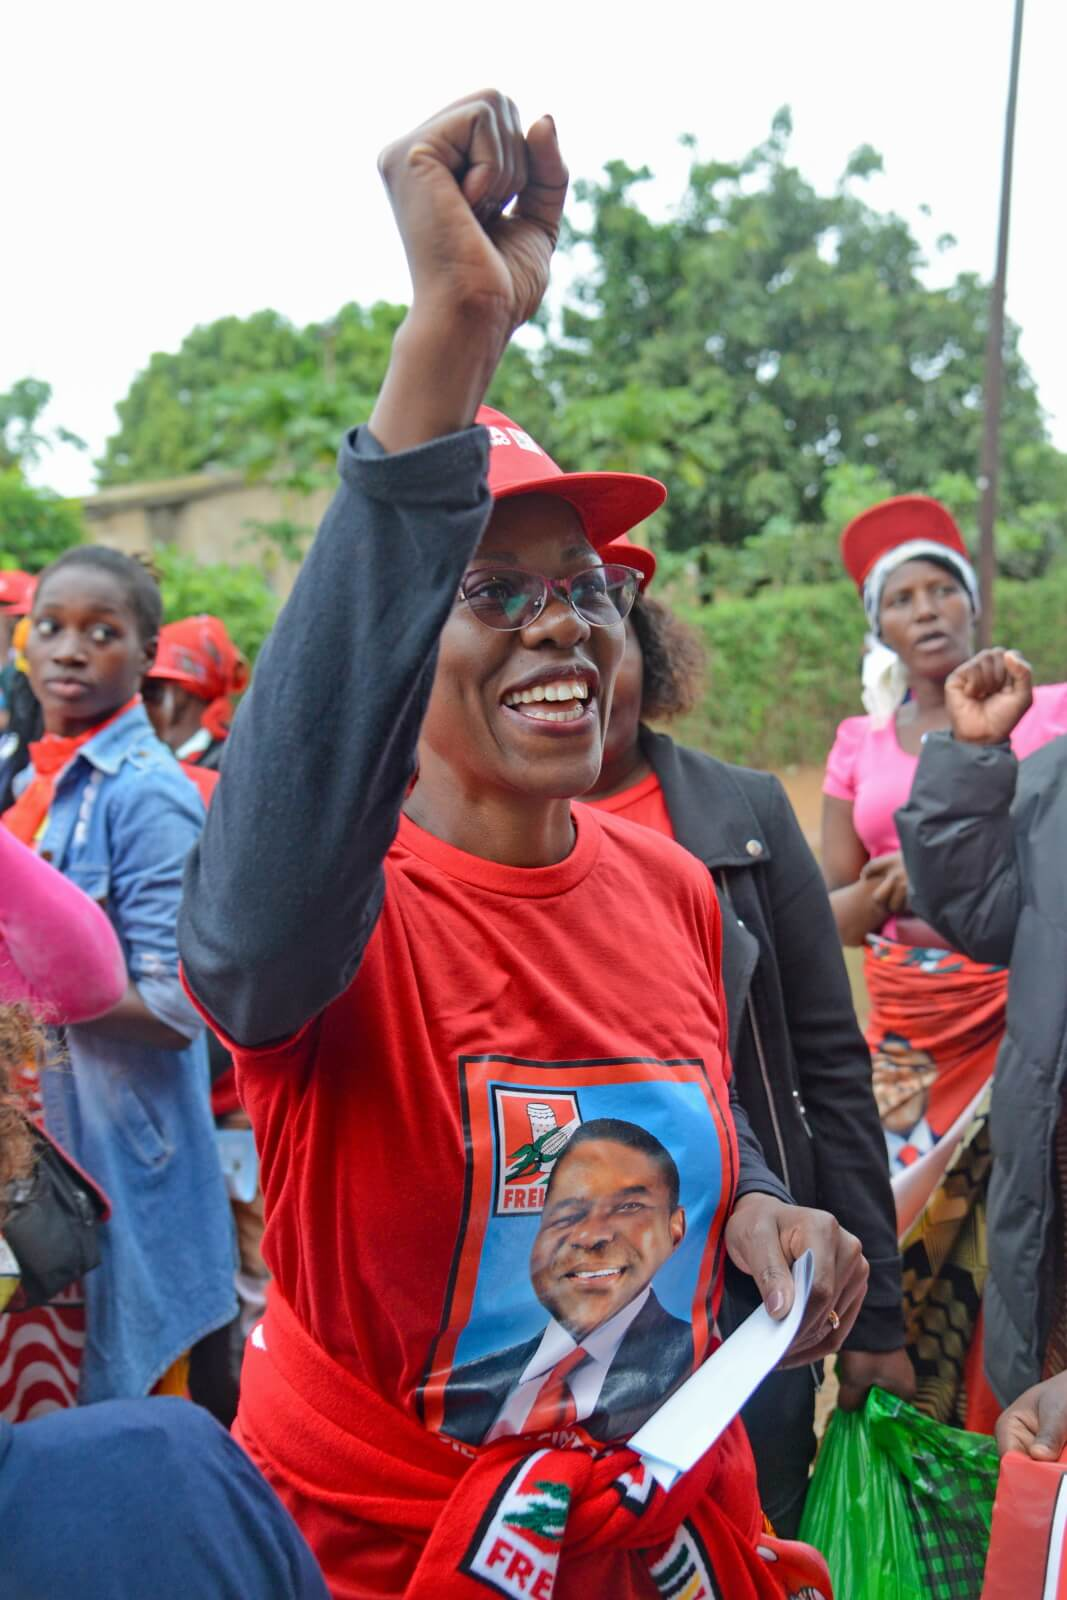 Wybory w Mozambiku fot. EPA/ANTONIO SILVA